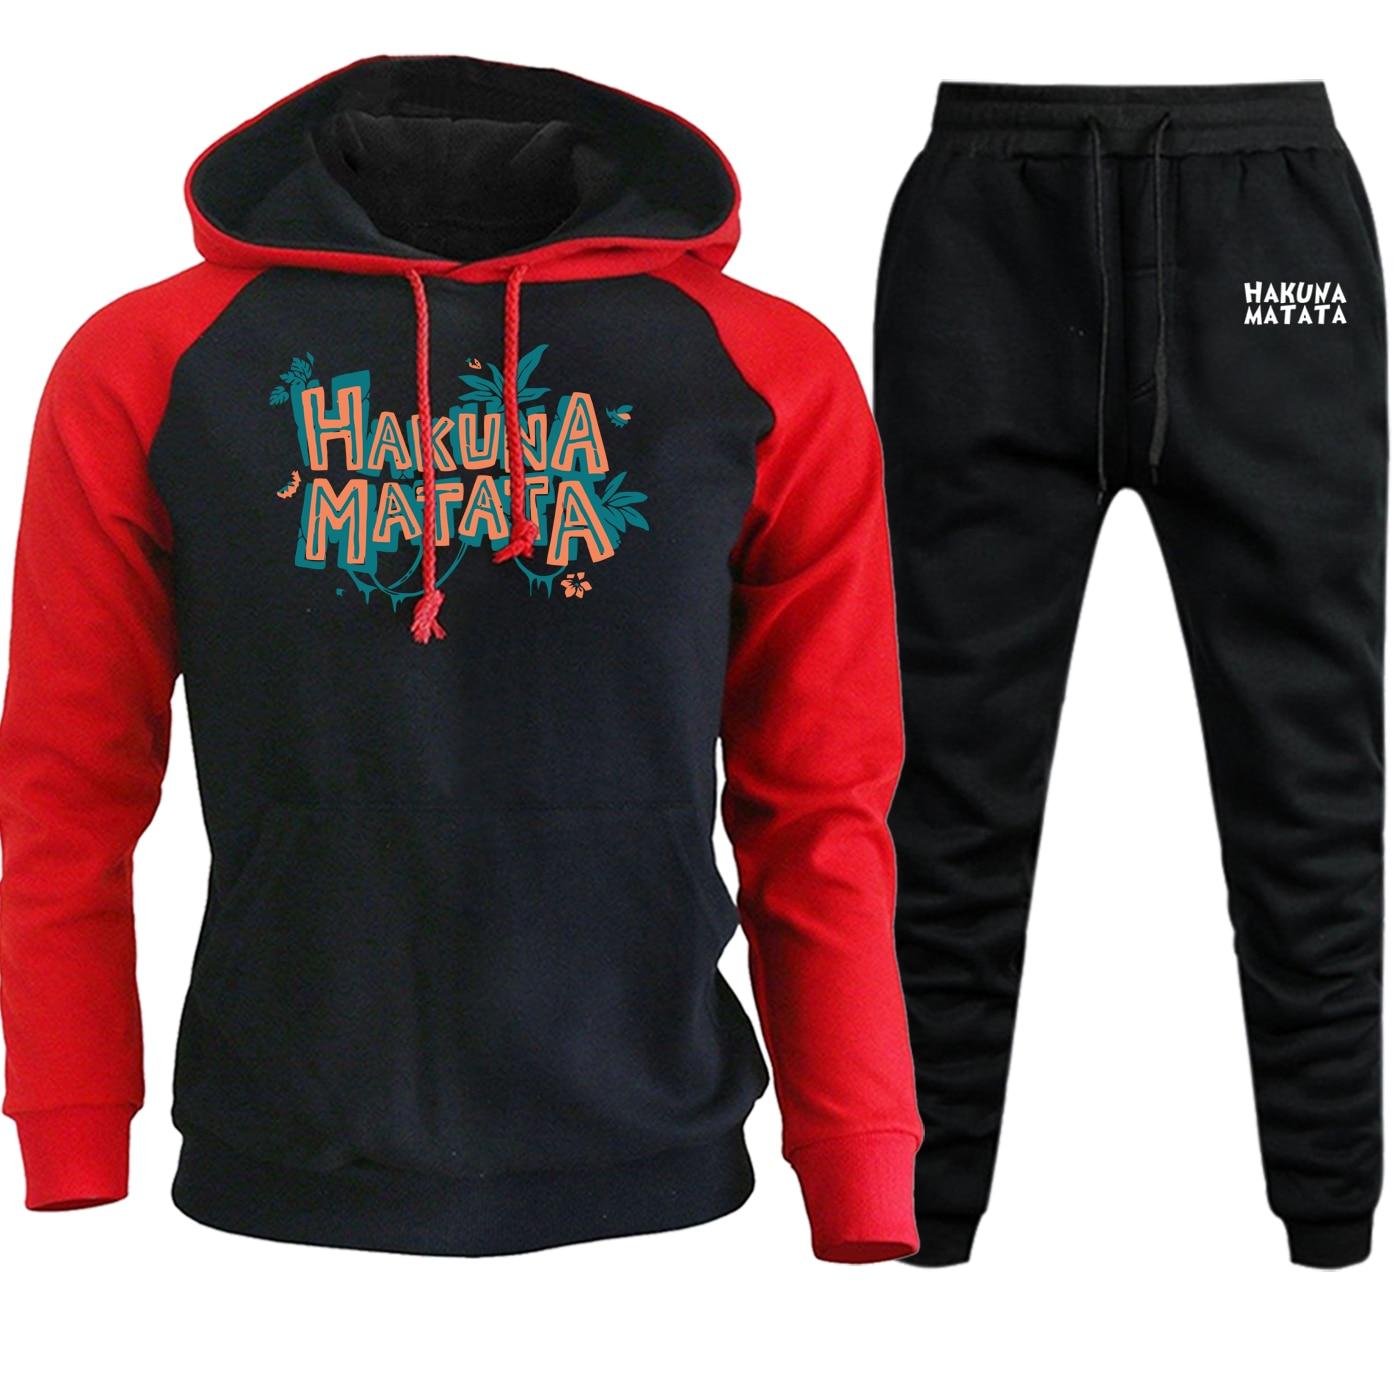 The Lion King Sportswear Mens Hoodie Raglan Autumn Winter 2019 New Simba Cartoon Suit Casual Fleece Hooded+Pants 2 Piece Set